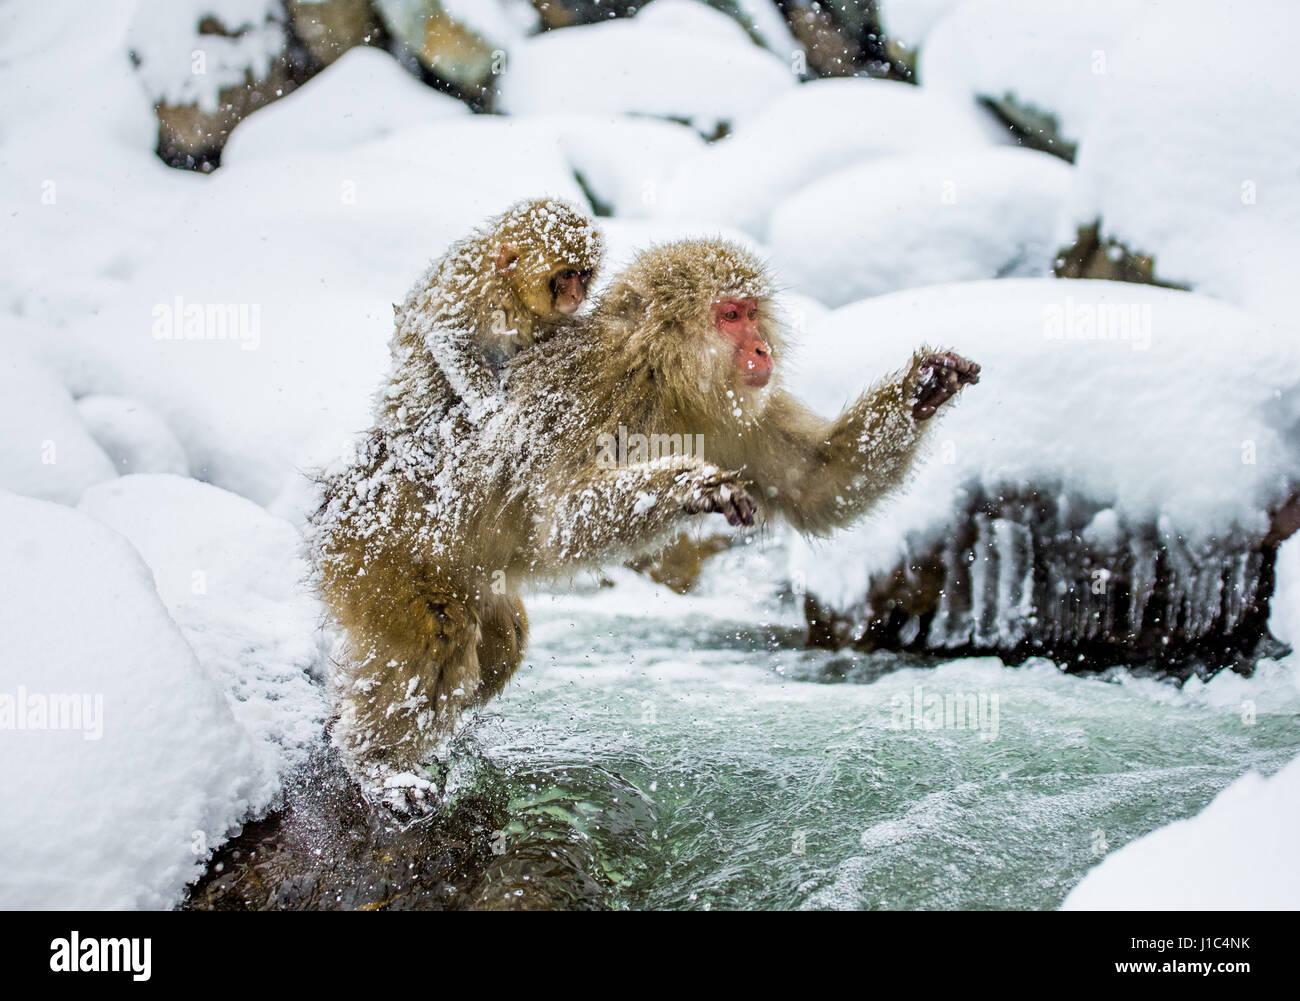 Japanese macaques jumping through a small river. Japan. Nagano. Jigokudani Monkey Park. An excellent illustration. - Stock Image